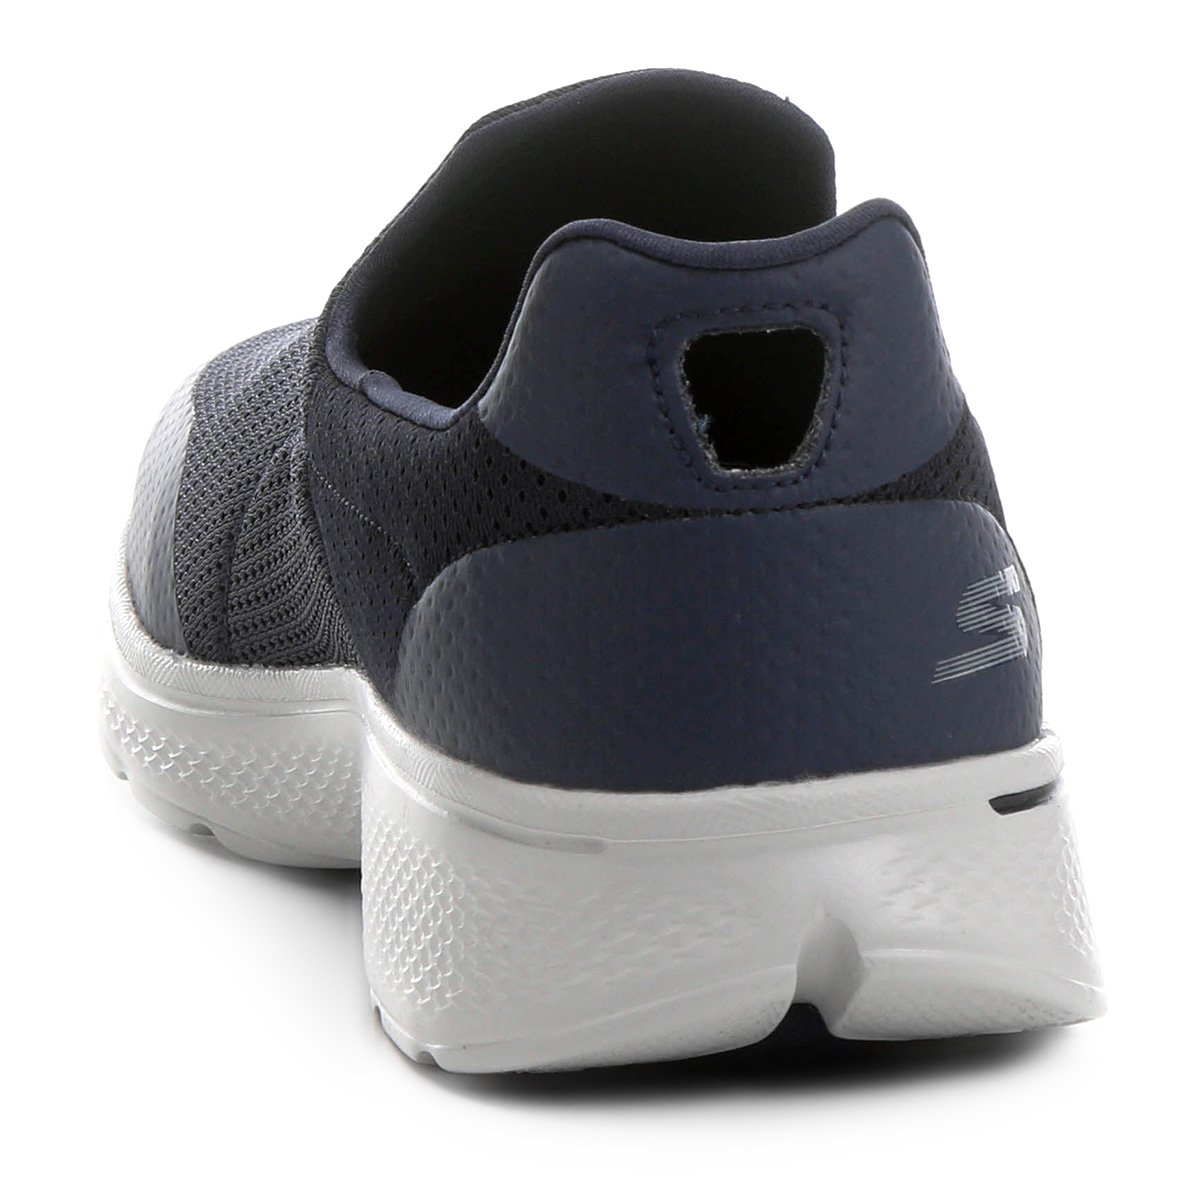 Tênis Skechers GOwalk 4 - Incredible Masculino - Azul Escuro ... 2000c4aa63637